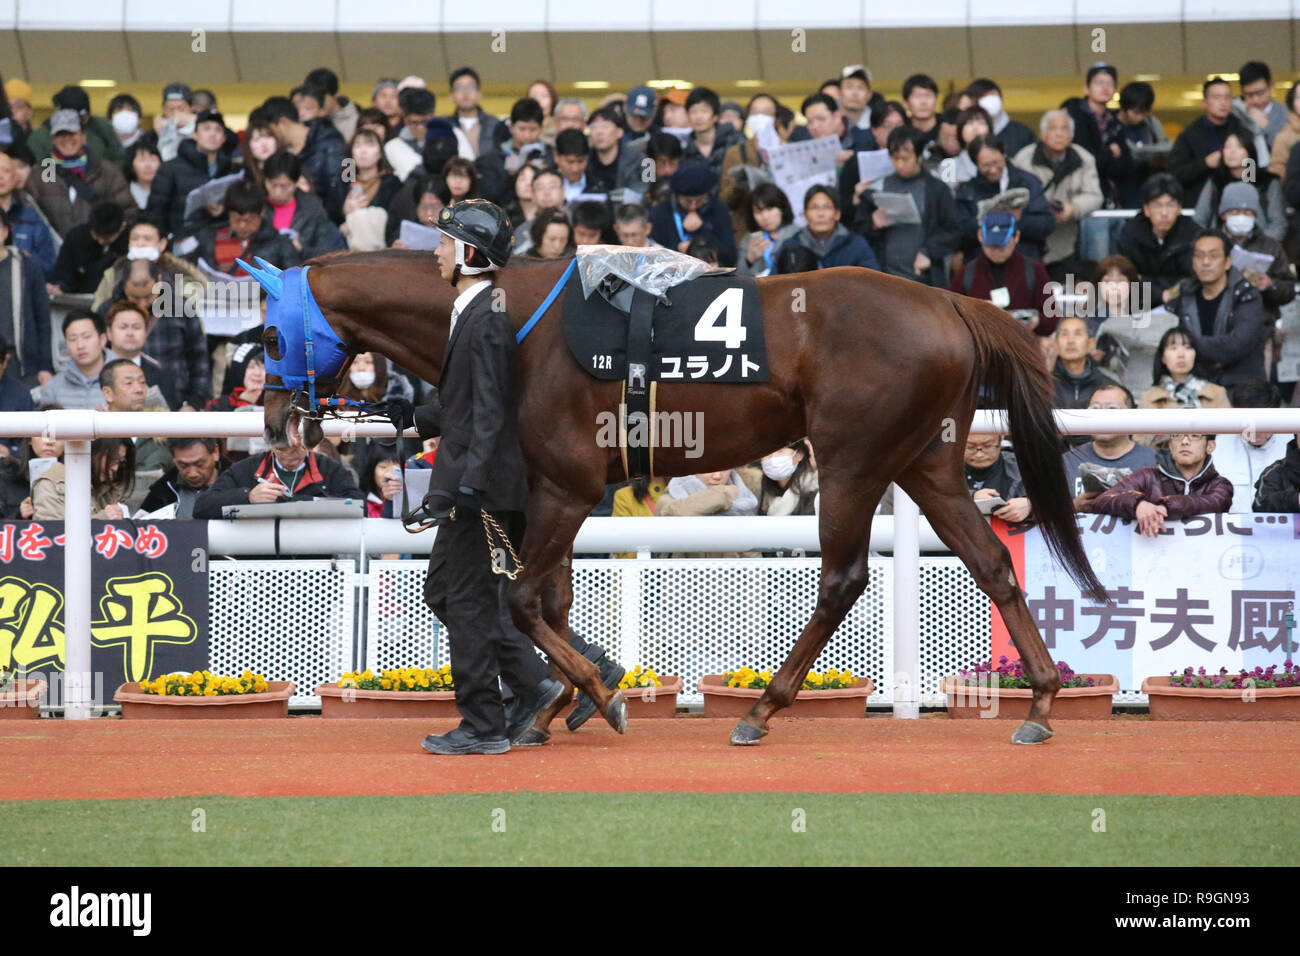 Hyogo Japan 23rd Dec 2018 Yuranoto Horse Racing Yuranoto Is